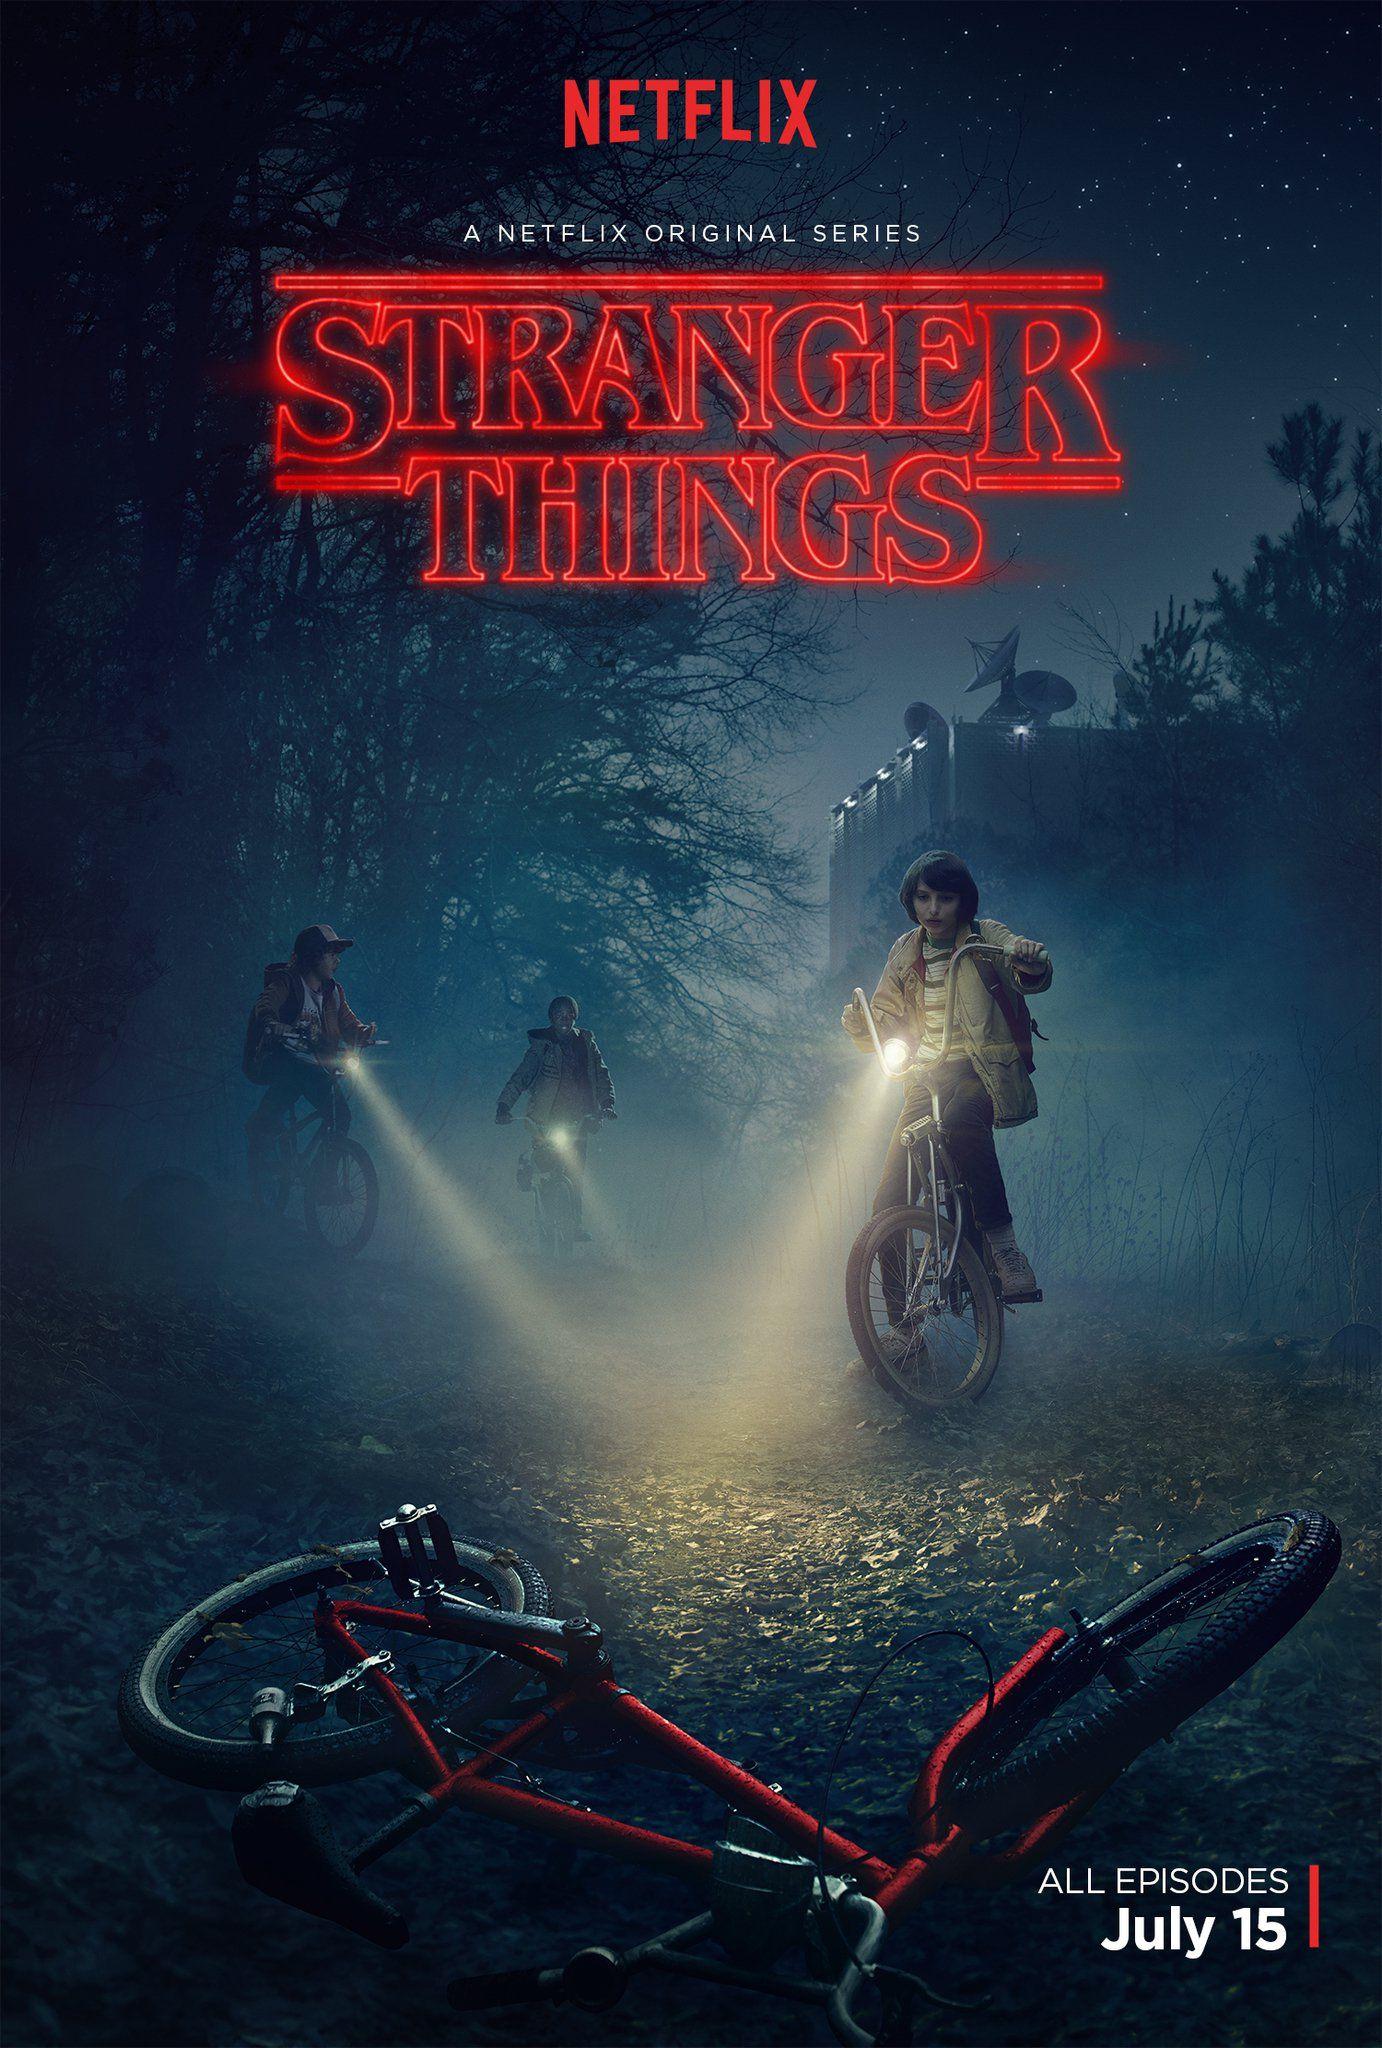 Stranger Things (15 Jul. 2016) Season 1, 8 Episodes